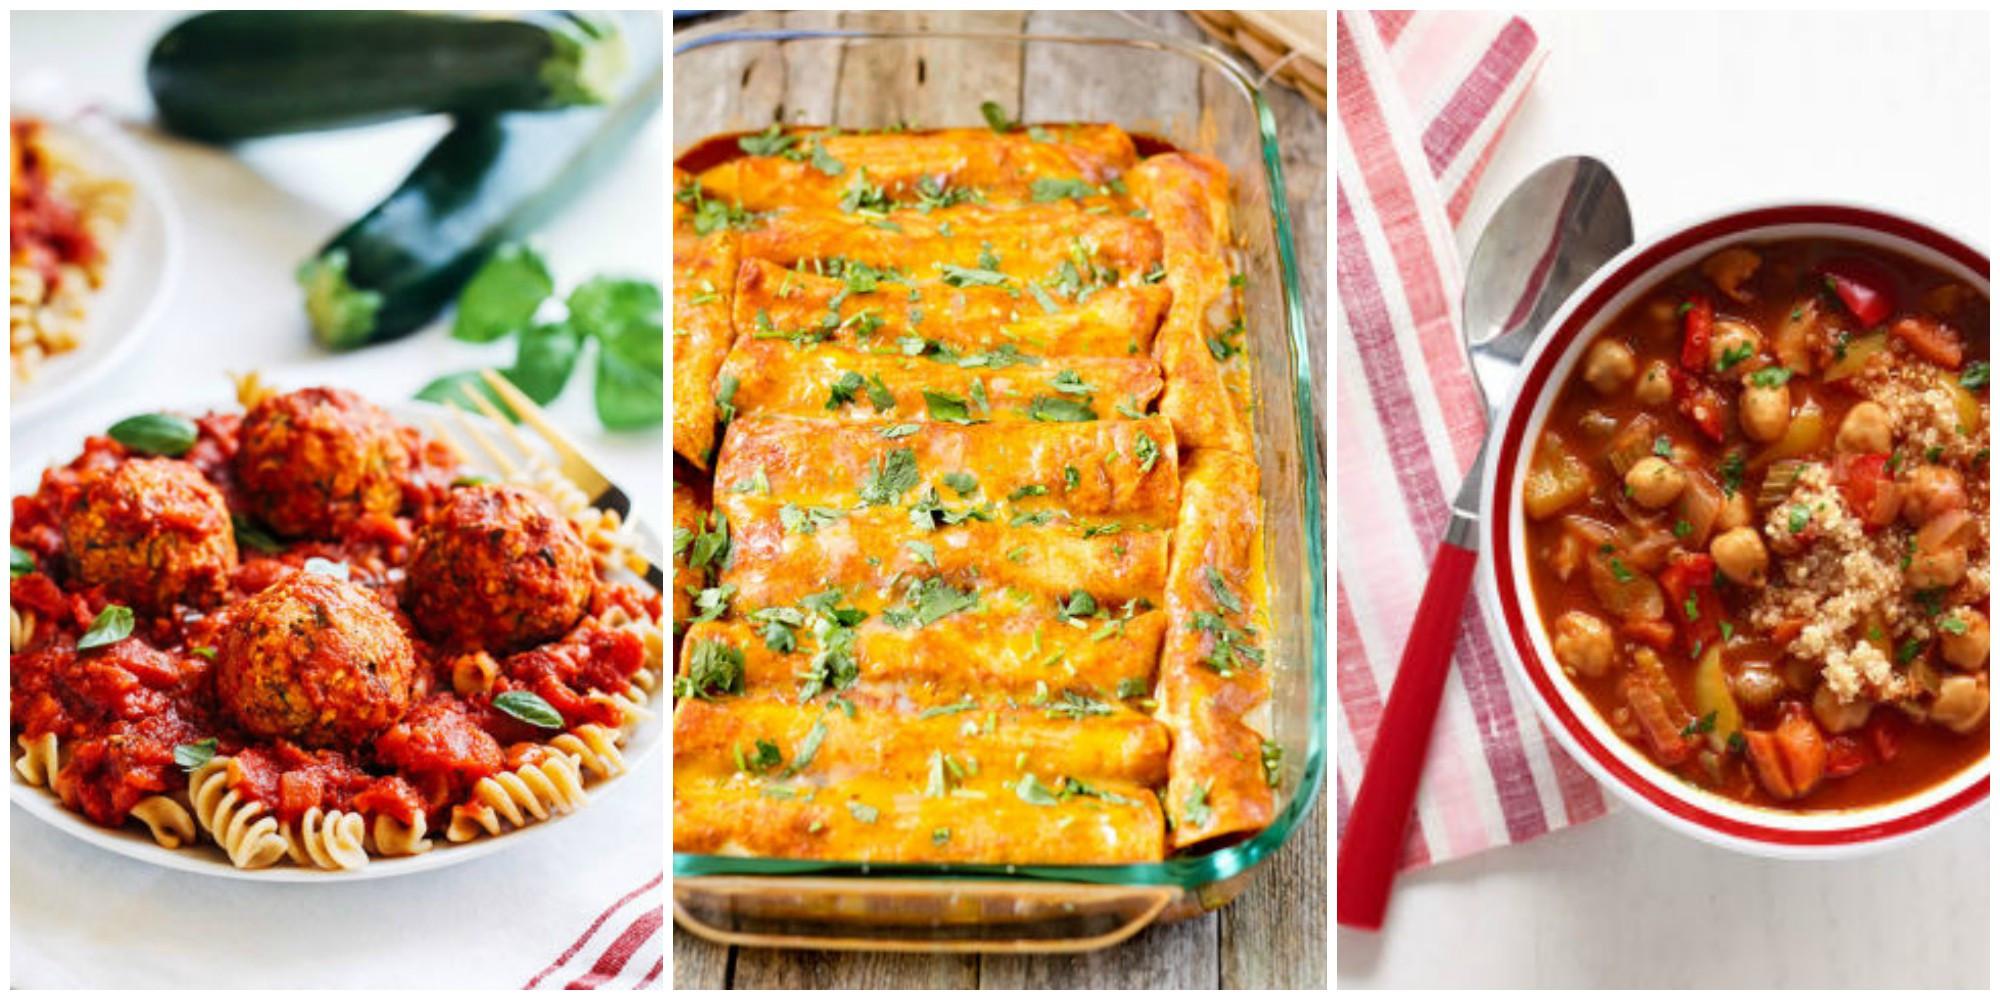 Simple Vegan Recipes  10 Easy Vegan Dinner Recipes Best Vegan Meal Ideas